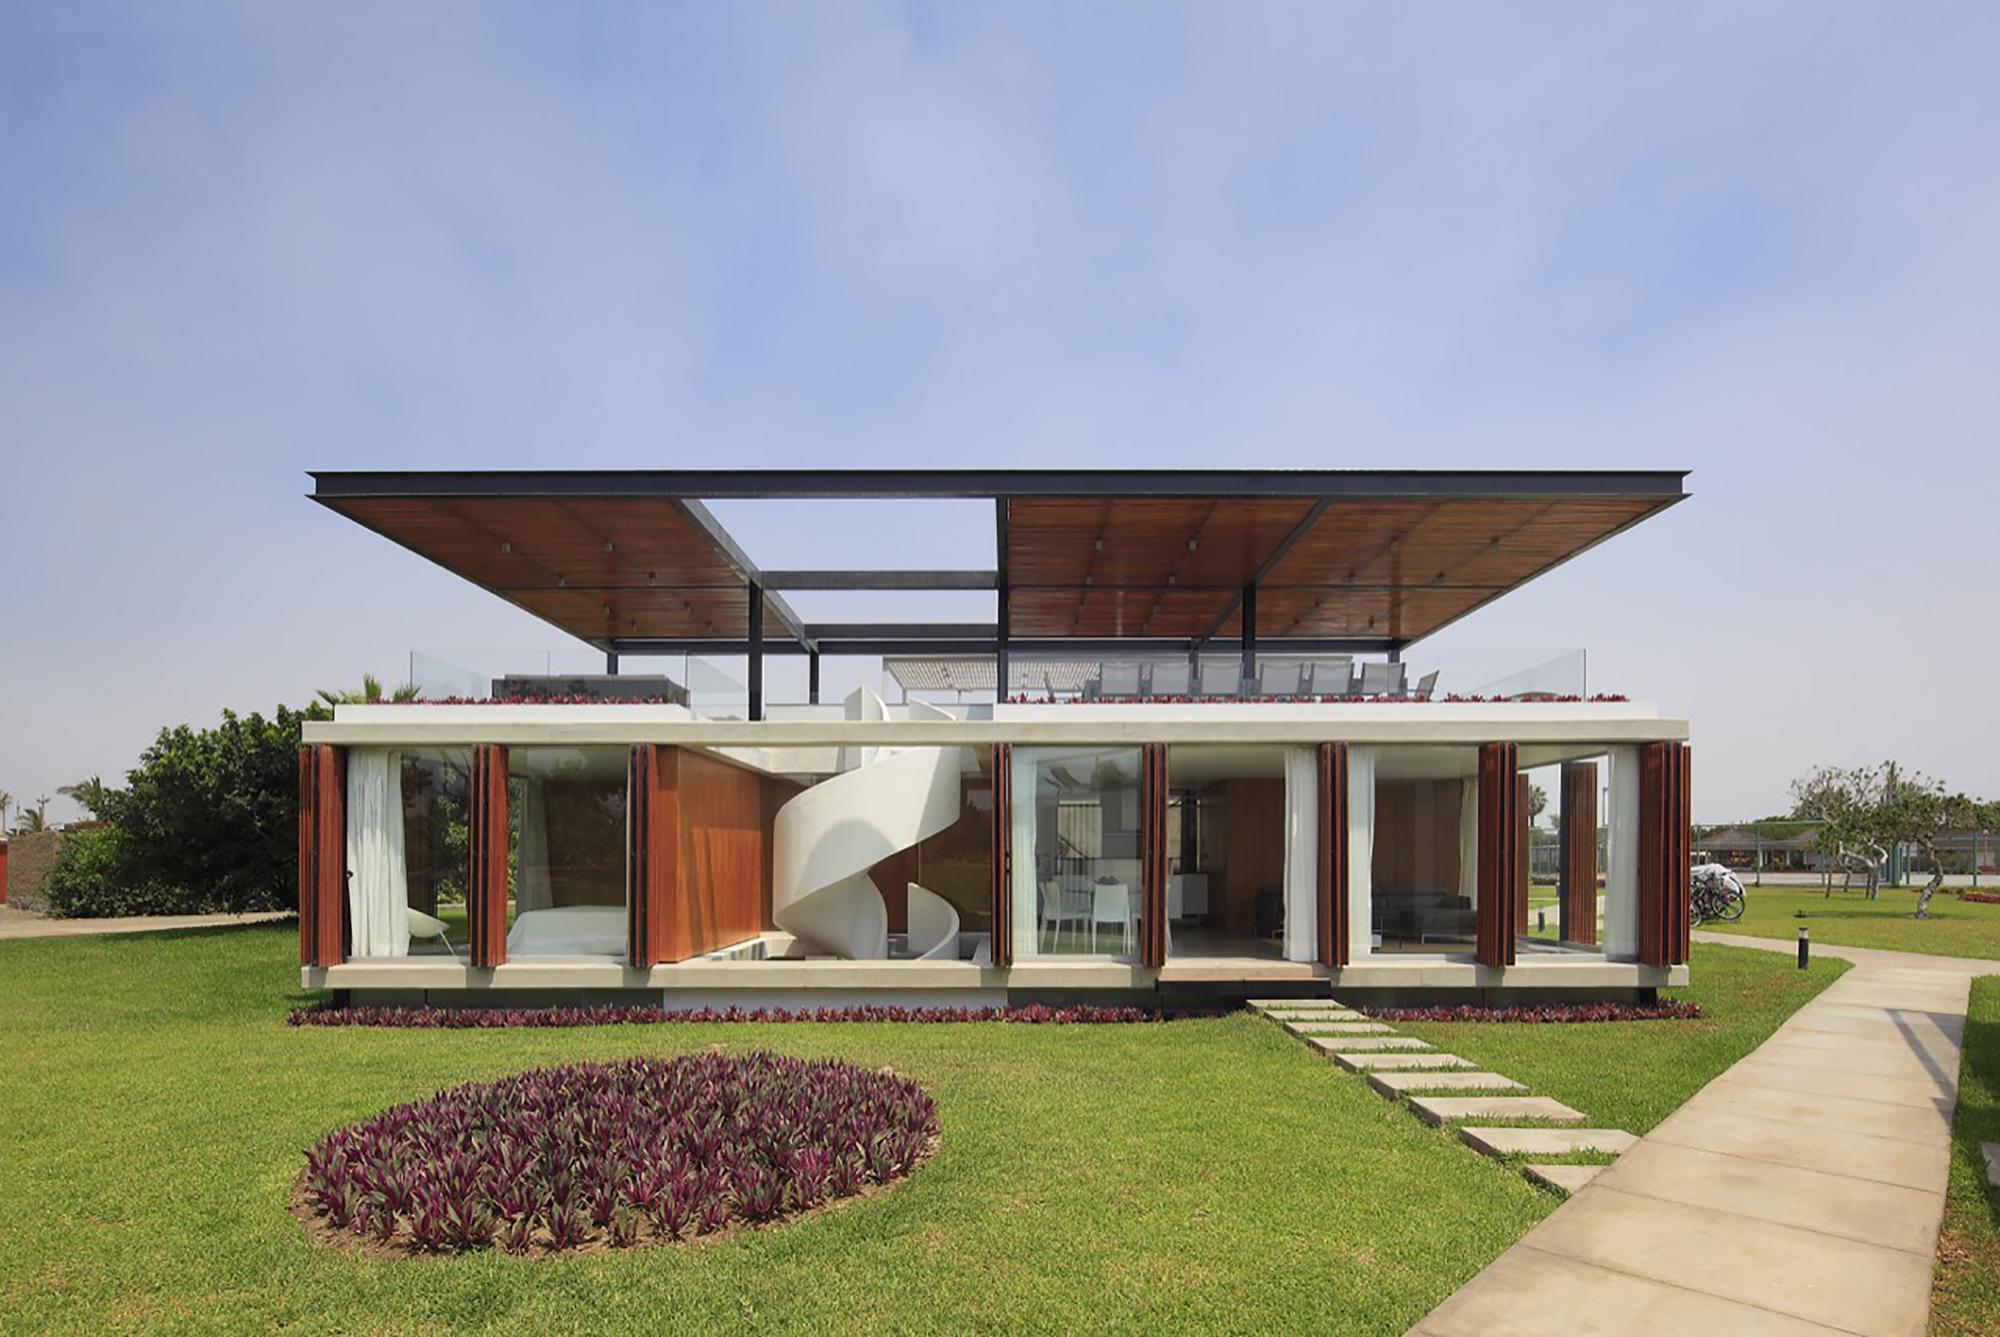 Casa asia jorge marsino prado plataforma arquitectura for Danish terrace